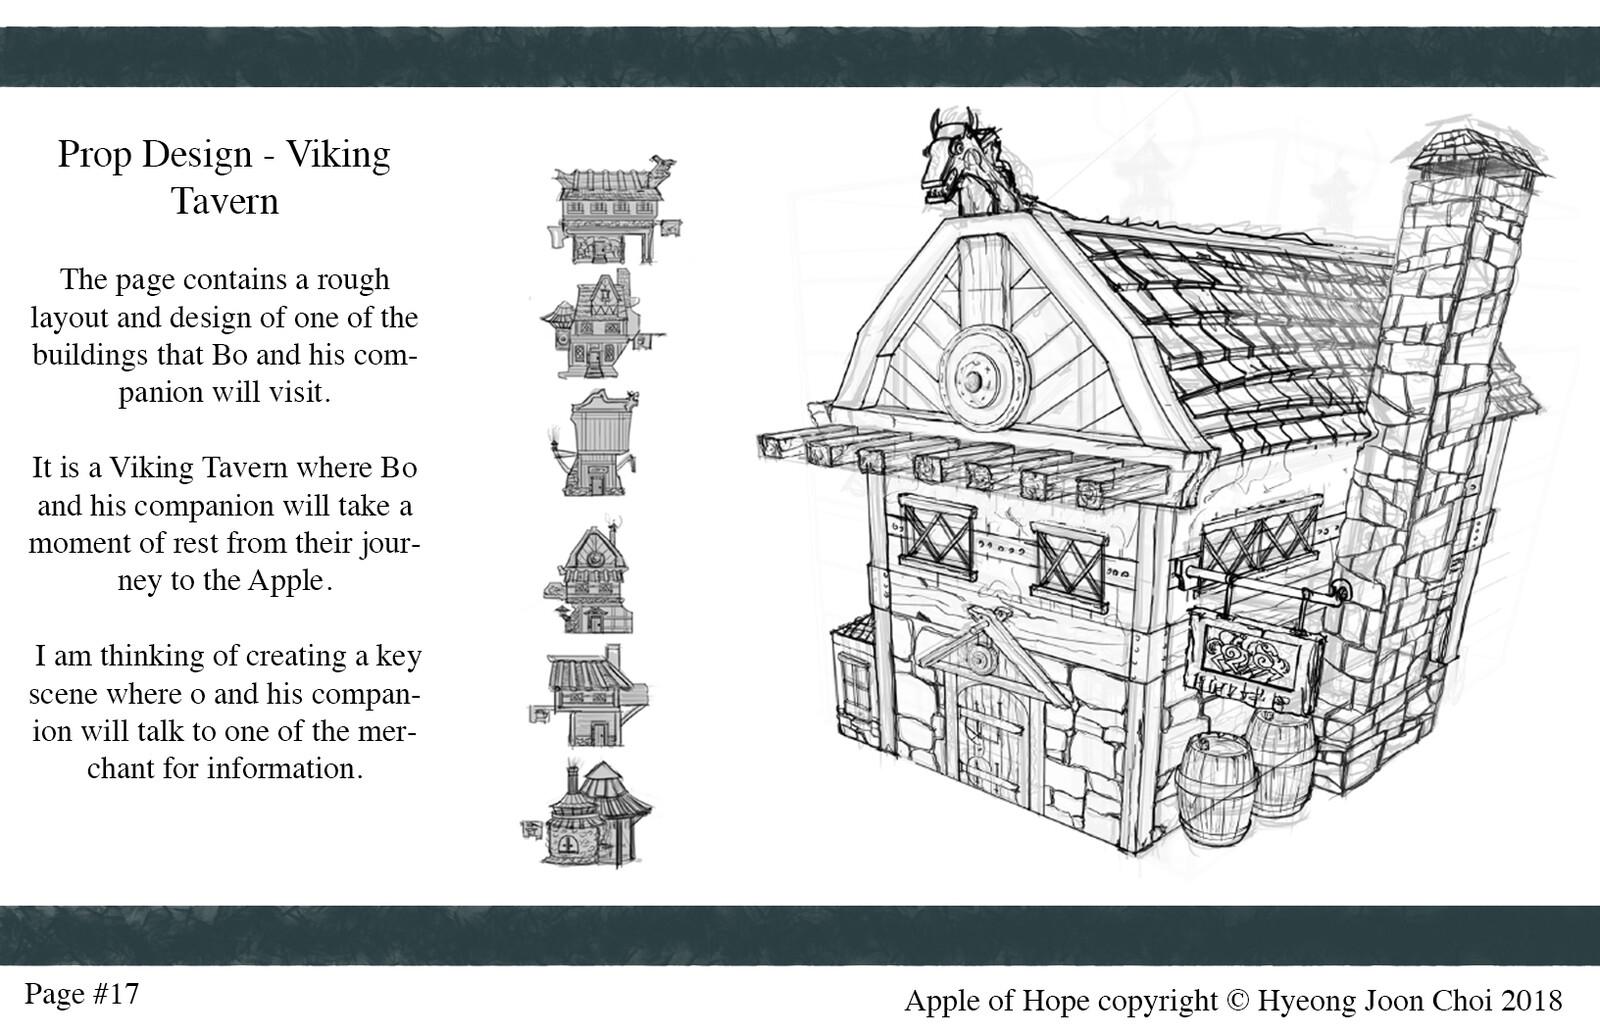 Production Design: Viking Tavern